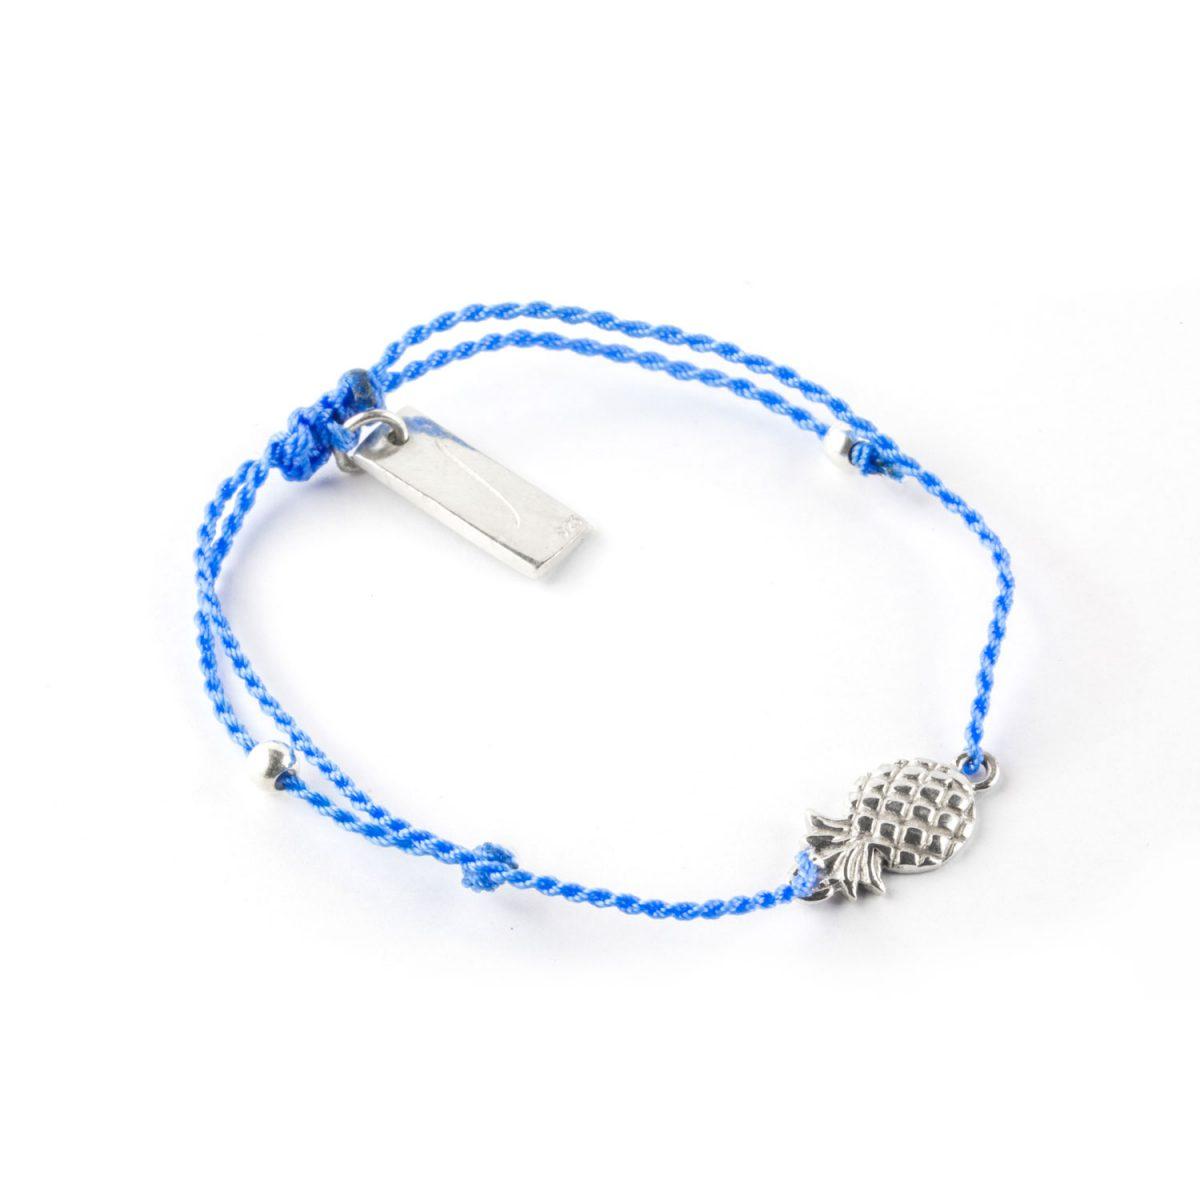 bracelet enfant fil bleu charme argent perle de jade